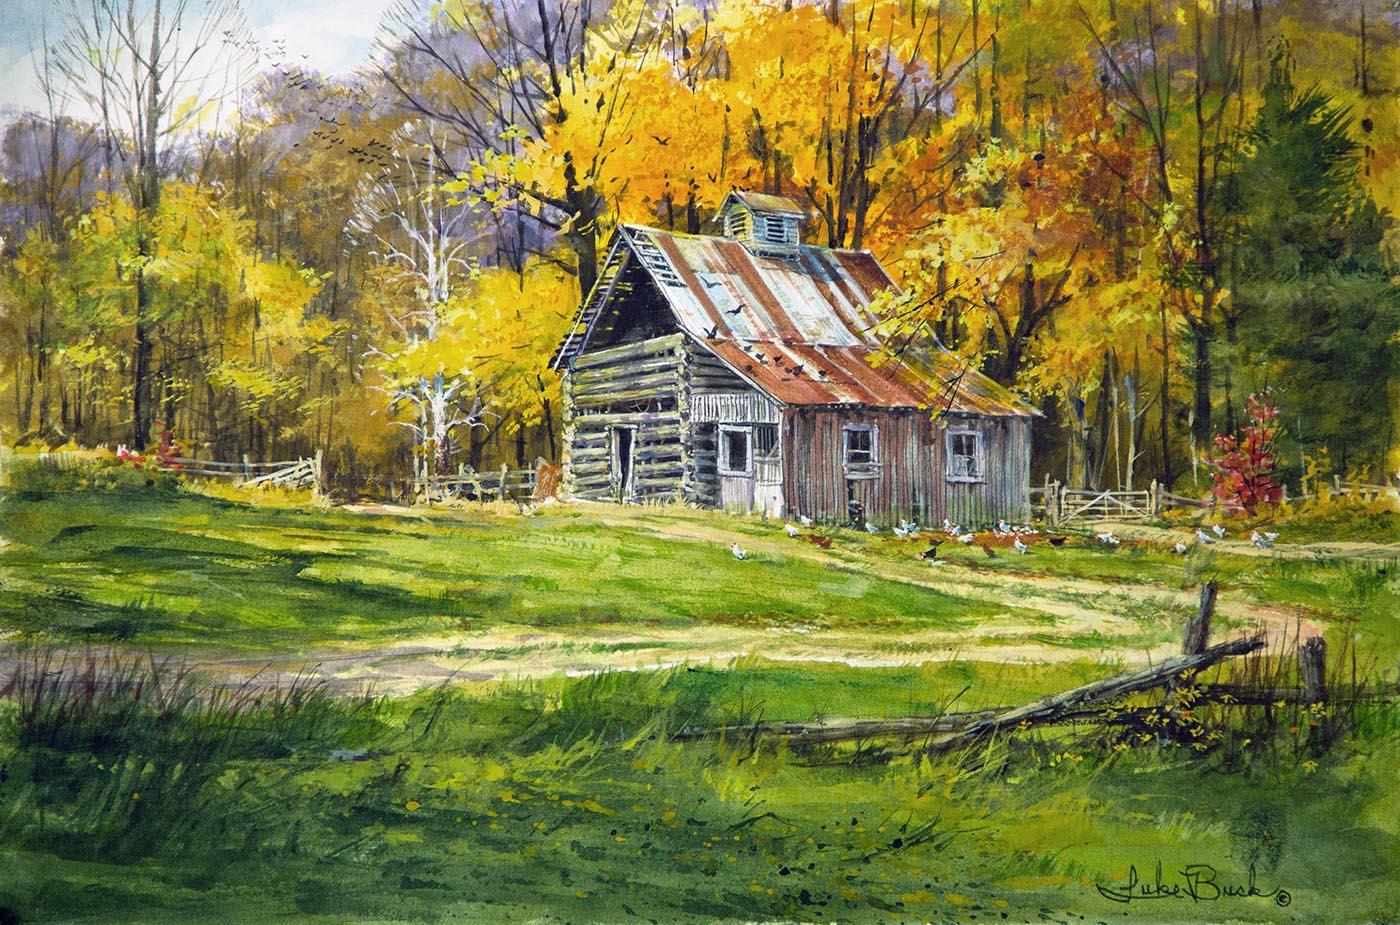 Hand Made Barn - Luke Buck